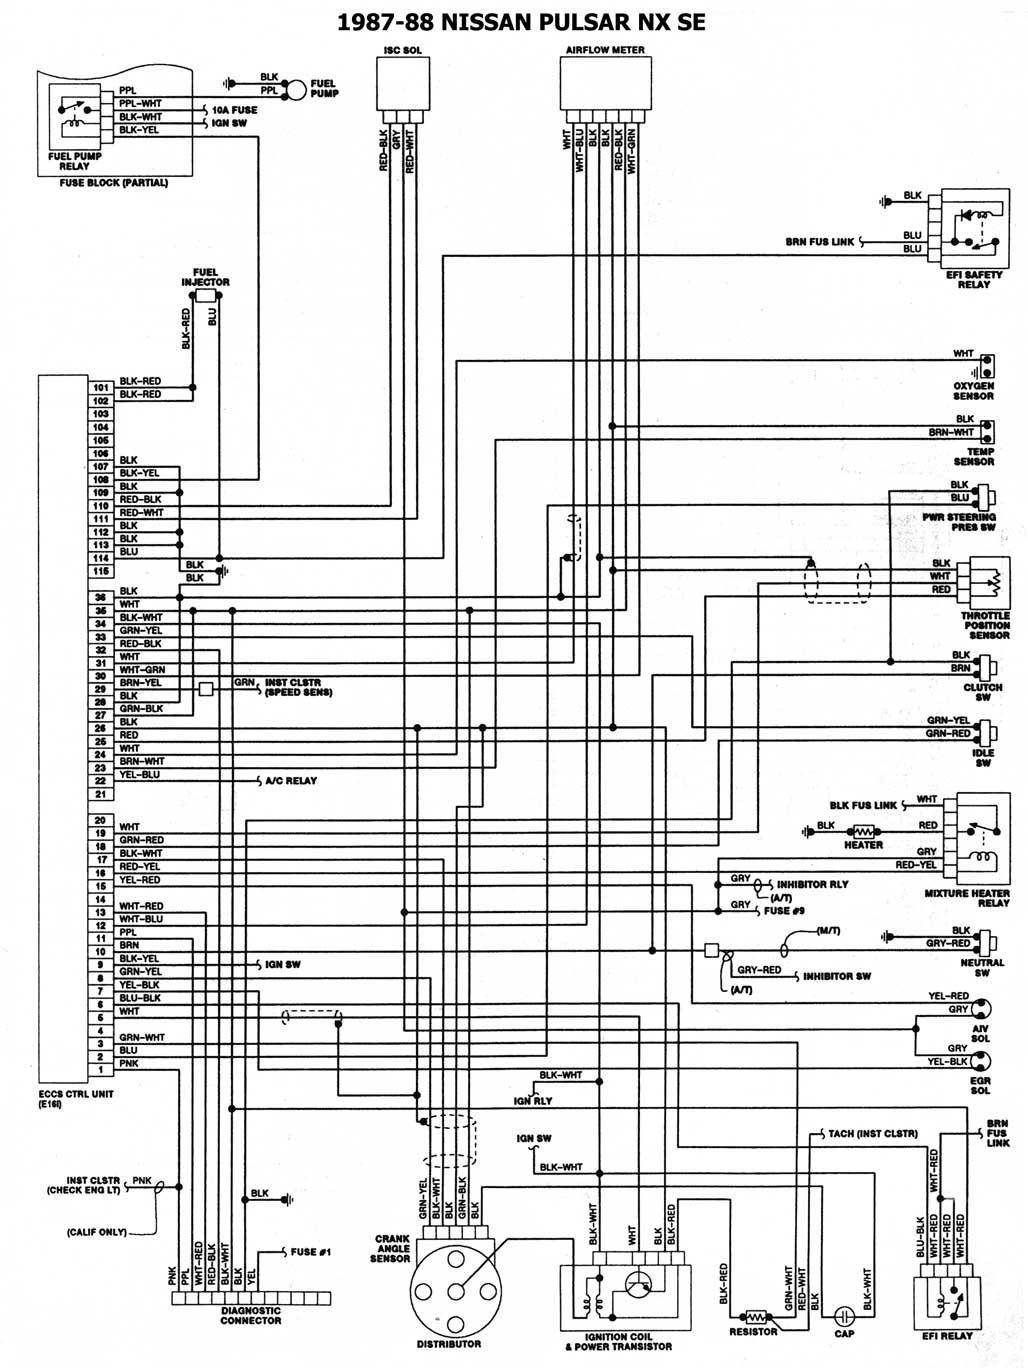 Diagrama Sistema Electrico Nissan Tsuru 8 In 2020 Electrical Wiring Diagram Toyota Toyota Camry